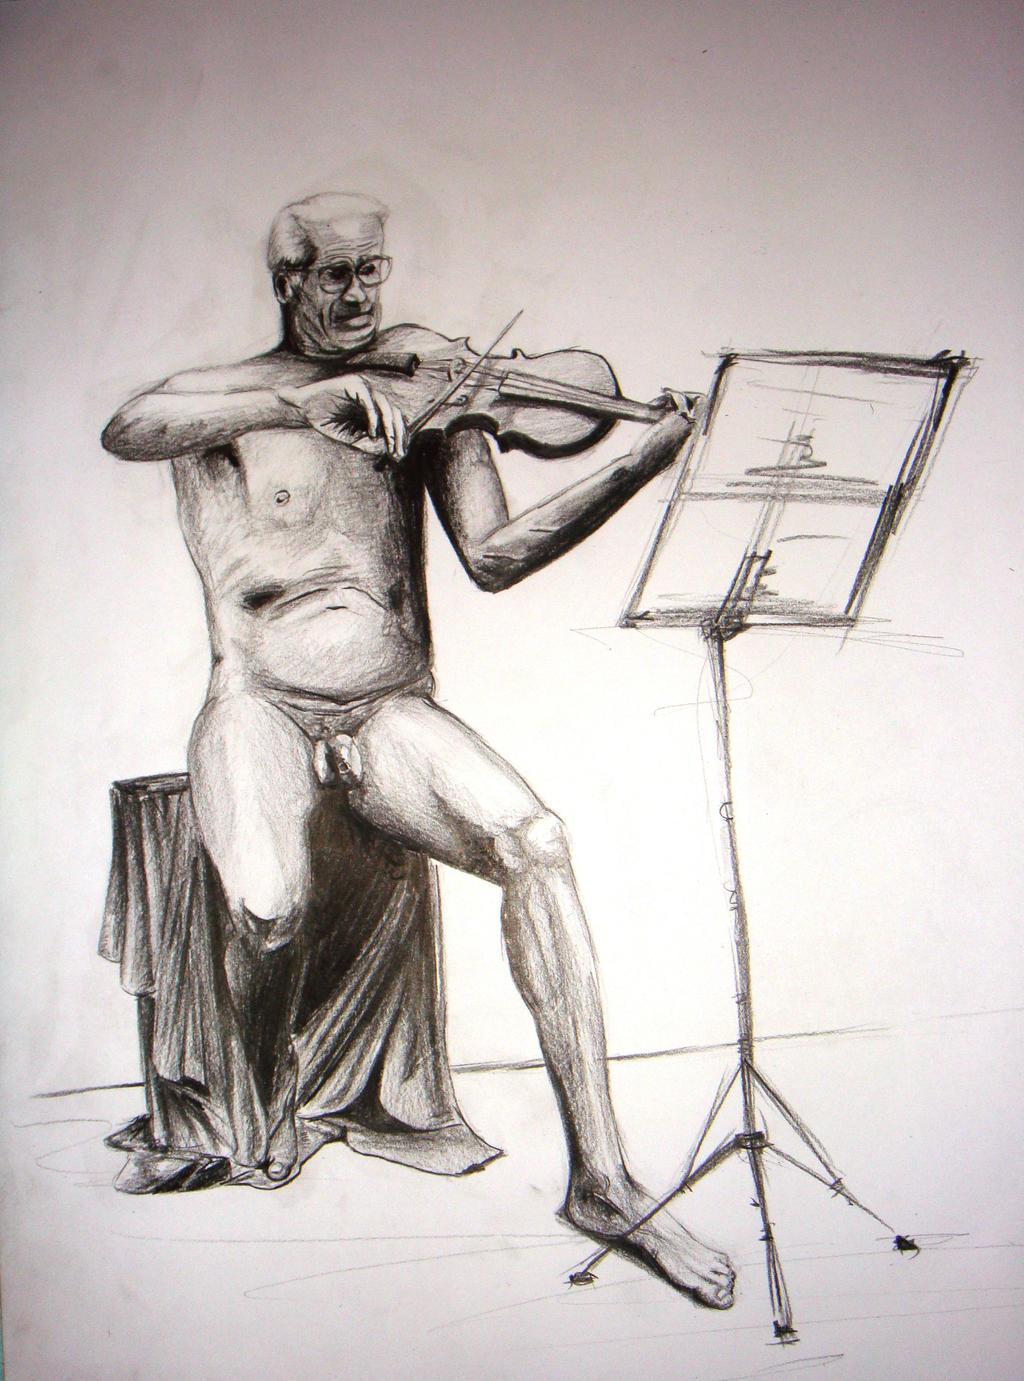 Violin 2012 - Pencil Sketch by Balanyuk on DeviantArt